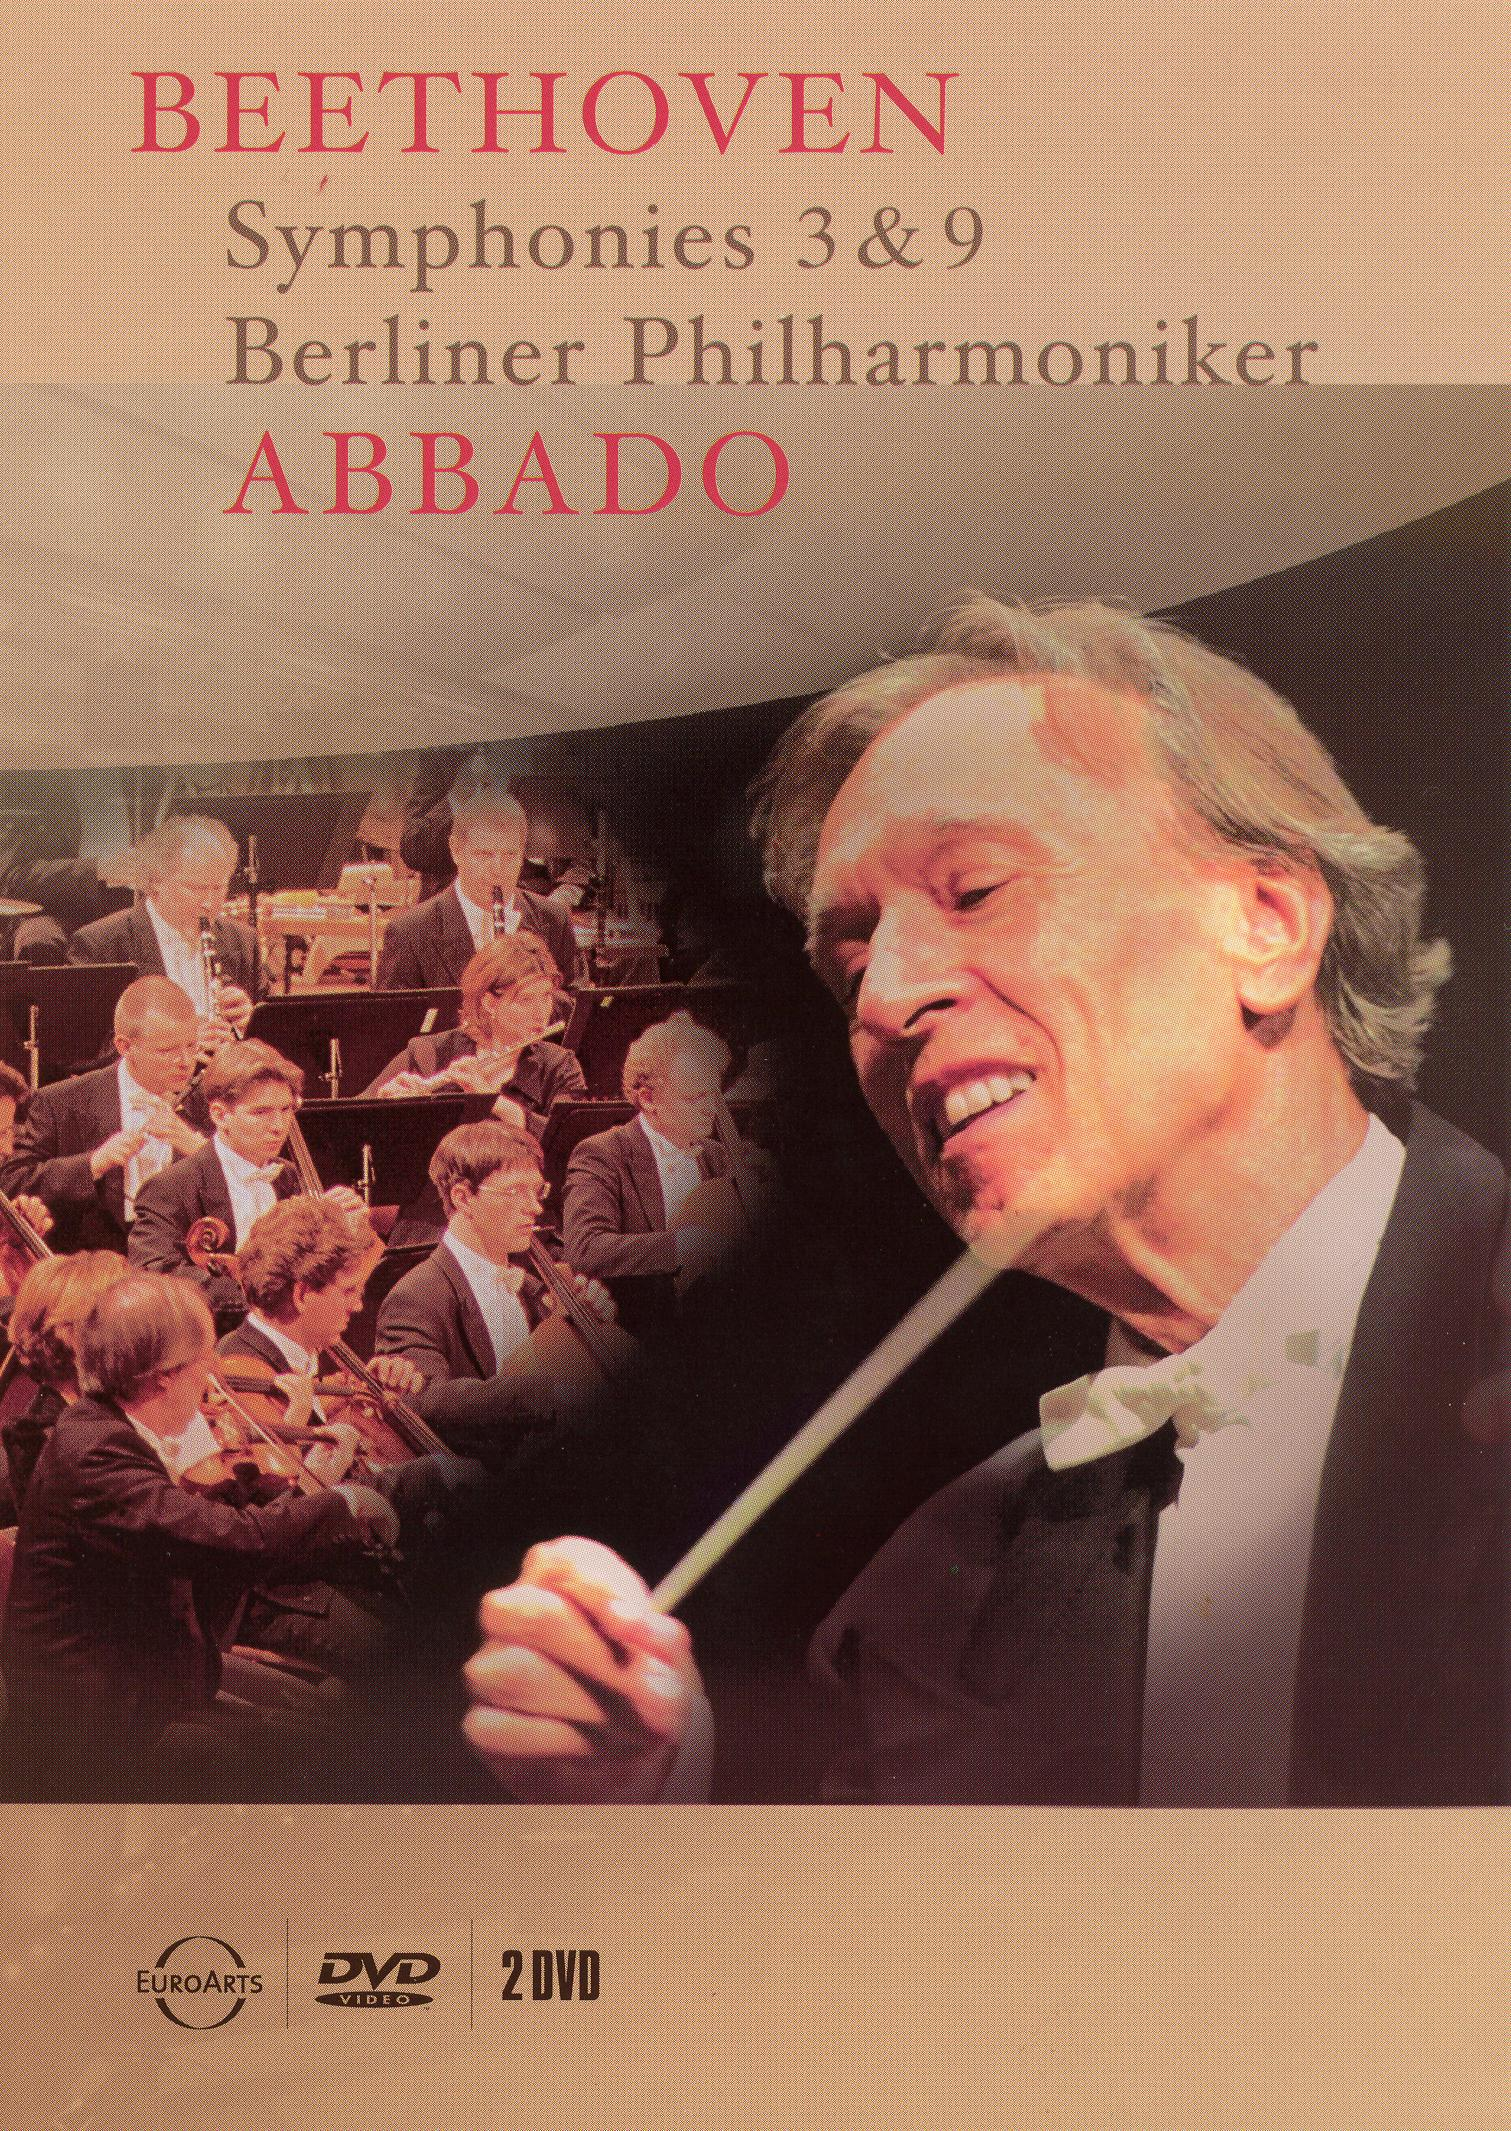 Claudio Abbado/Berliner Philharmoniker: Beethoven - Symphonies 3 & 9